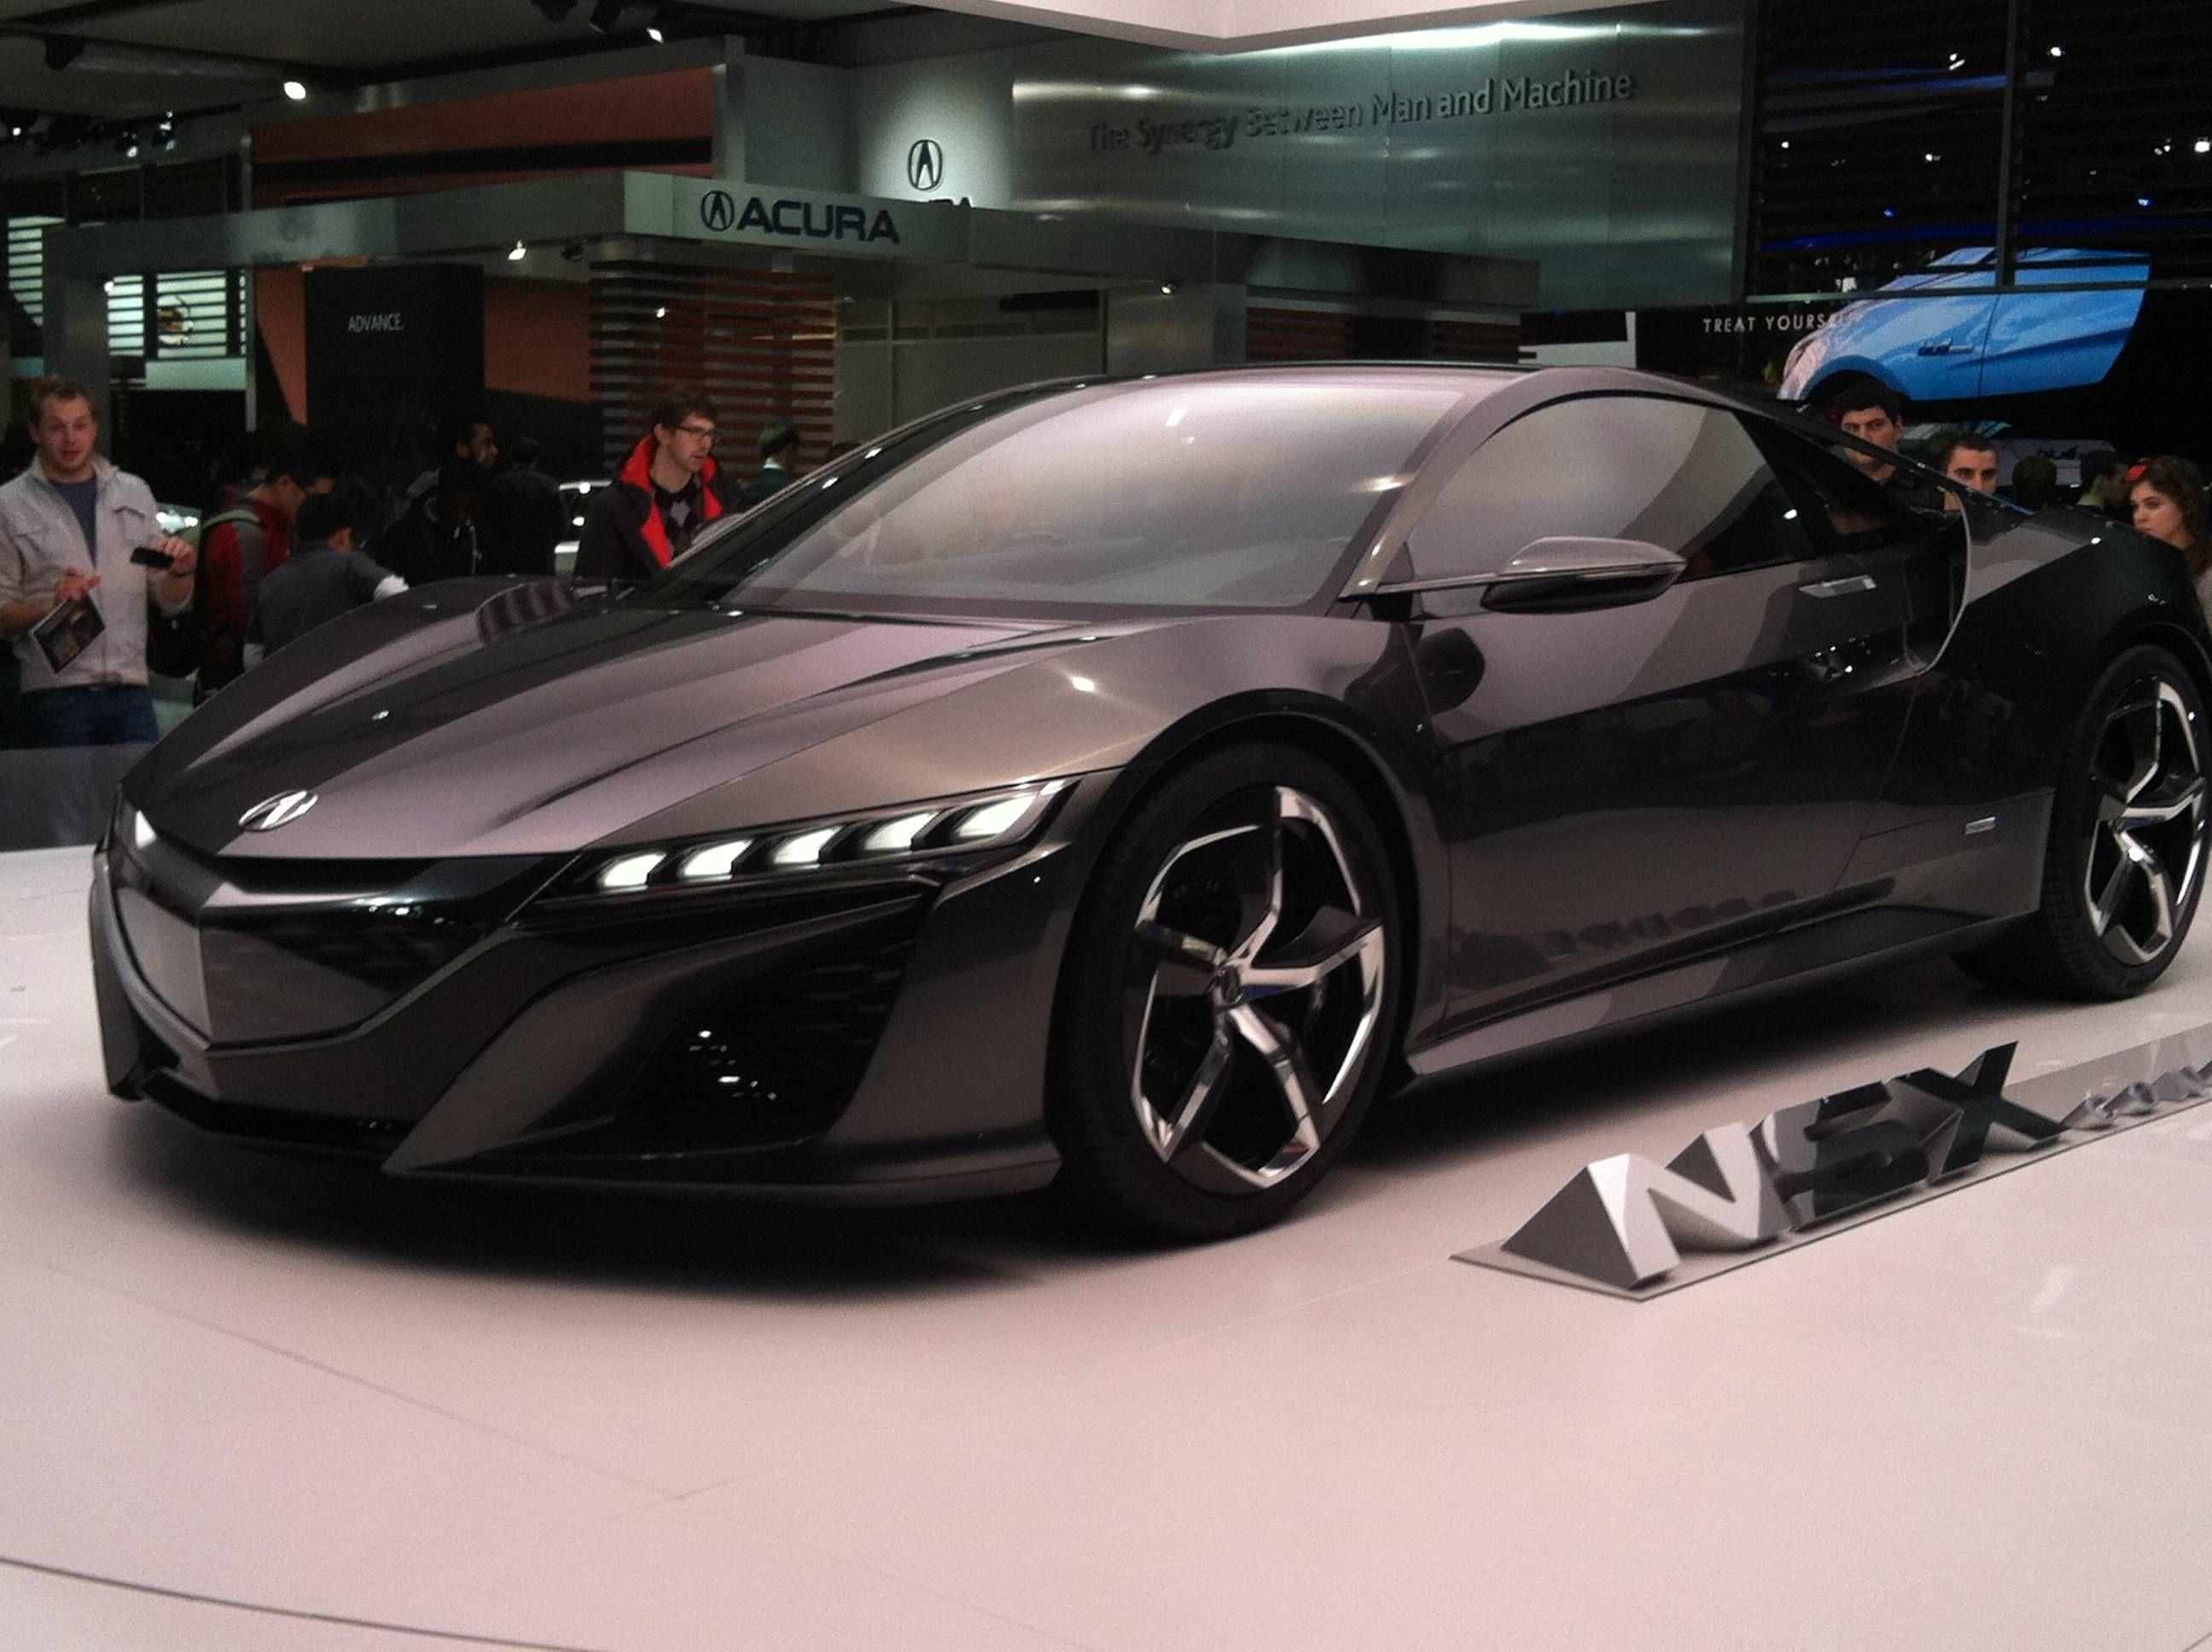 2013 Acura NSX Concept. | Vroom Vroom | Pinterest | Acura nsx, Cars ...